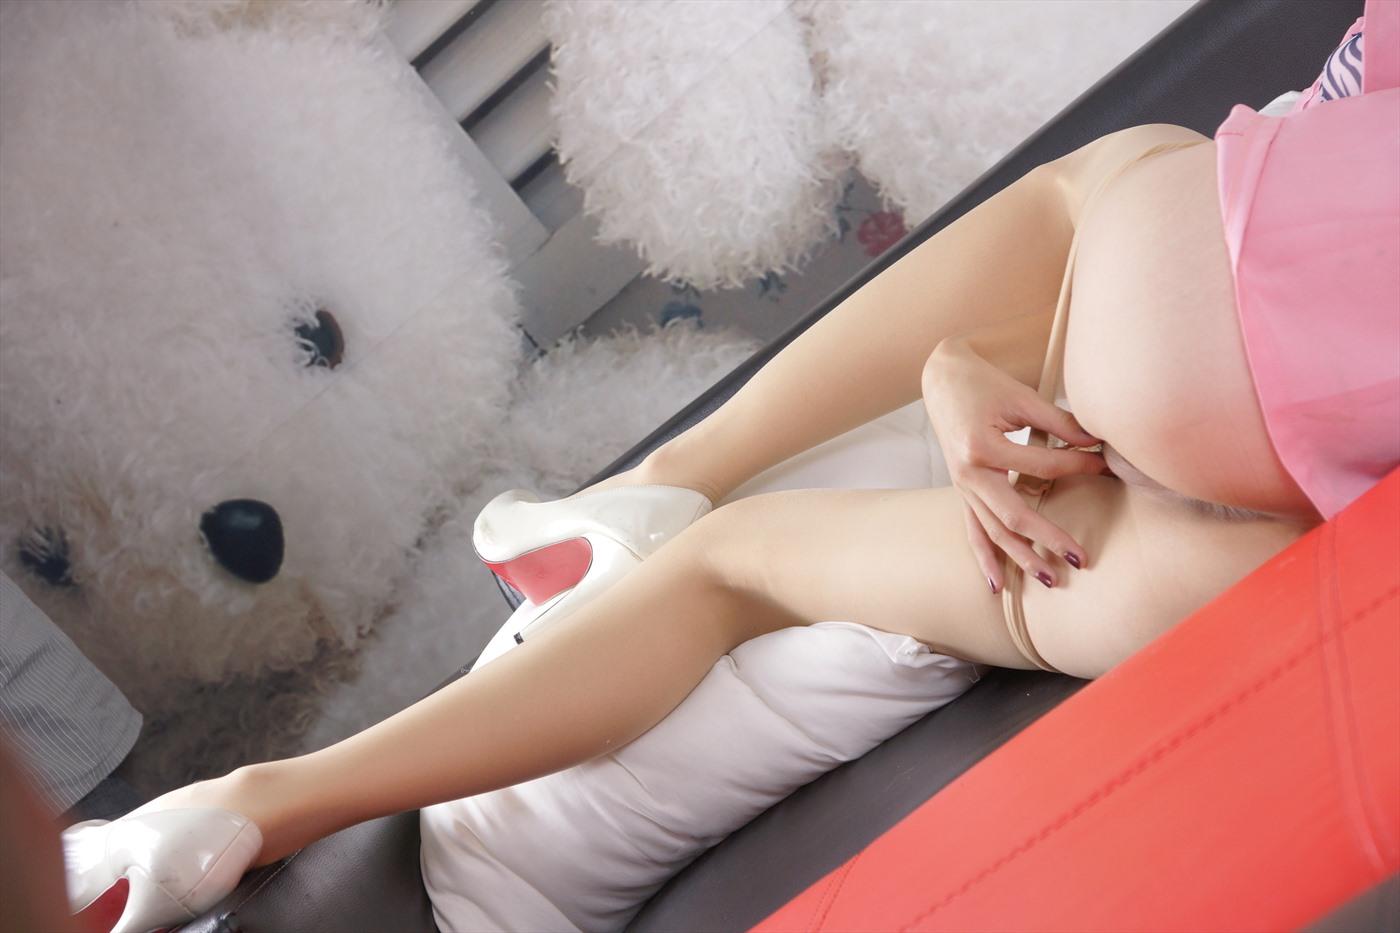 IMG 0183 - 82 Taiwan Model Jieli Juicy Pussy